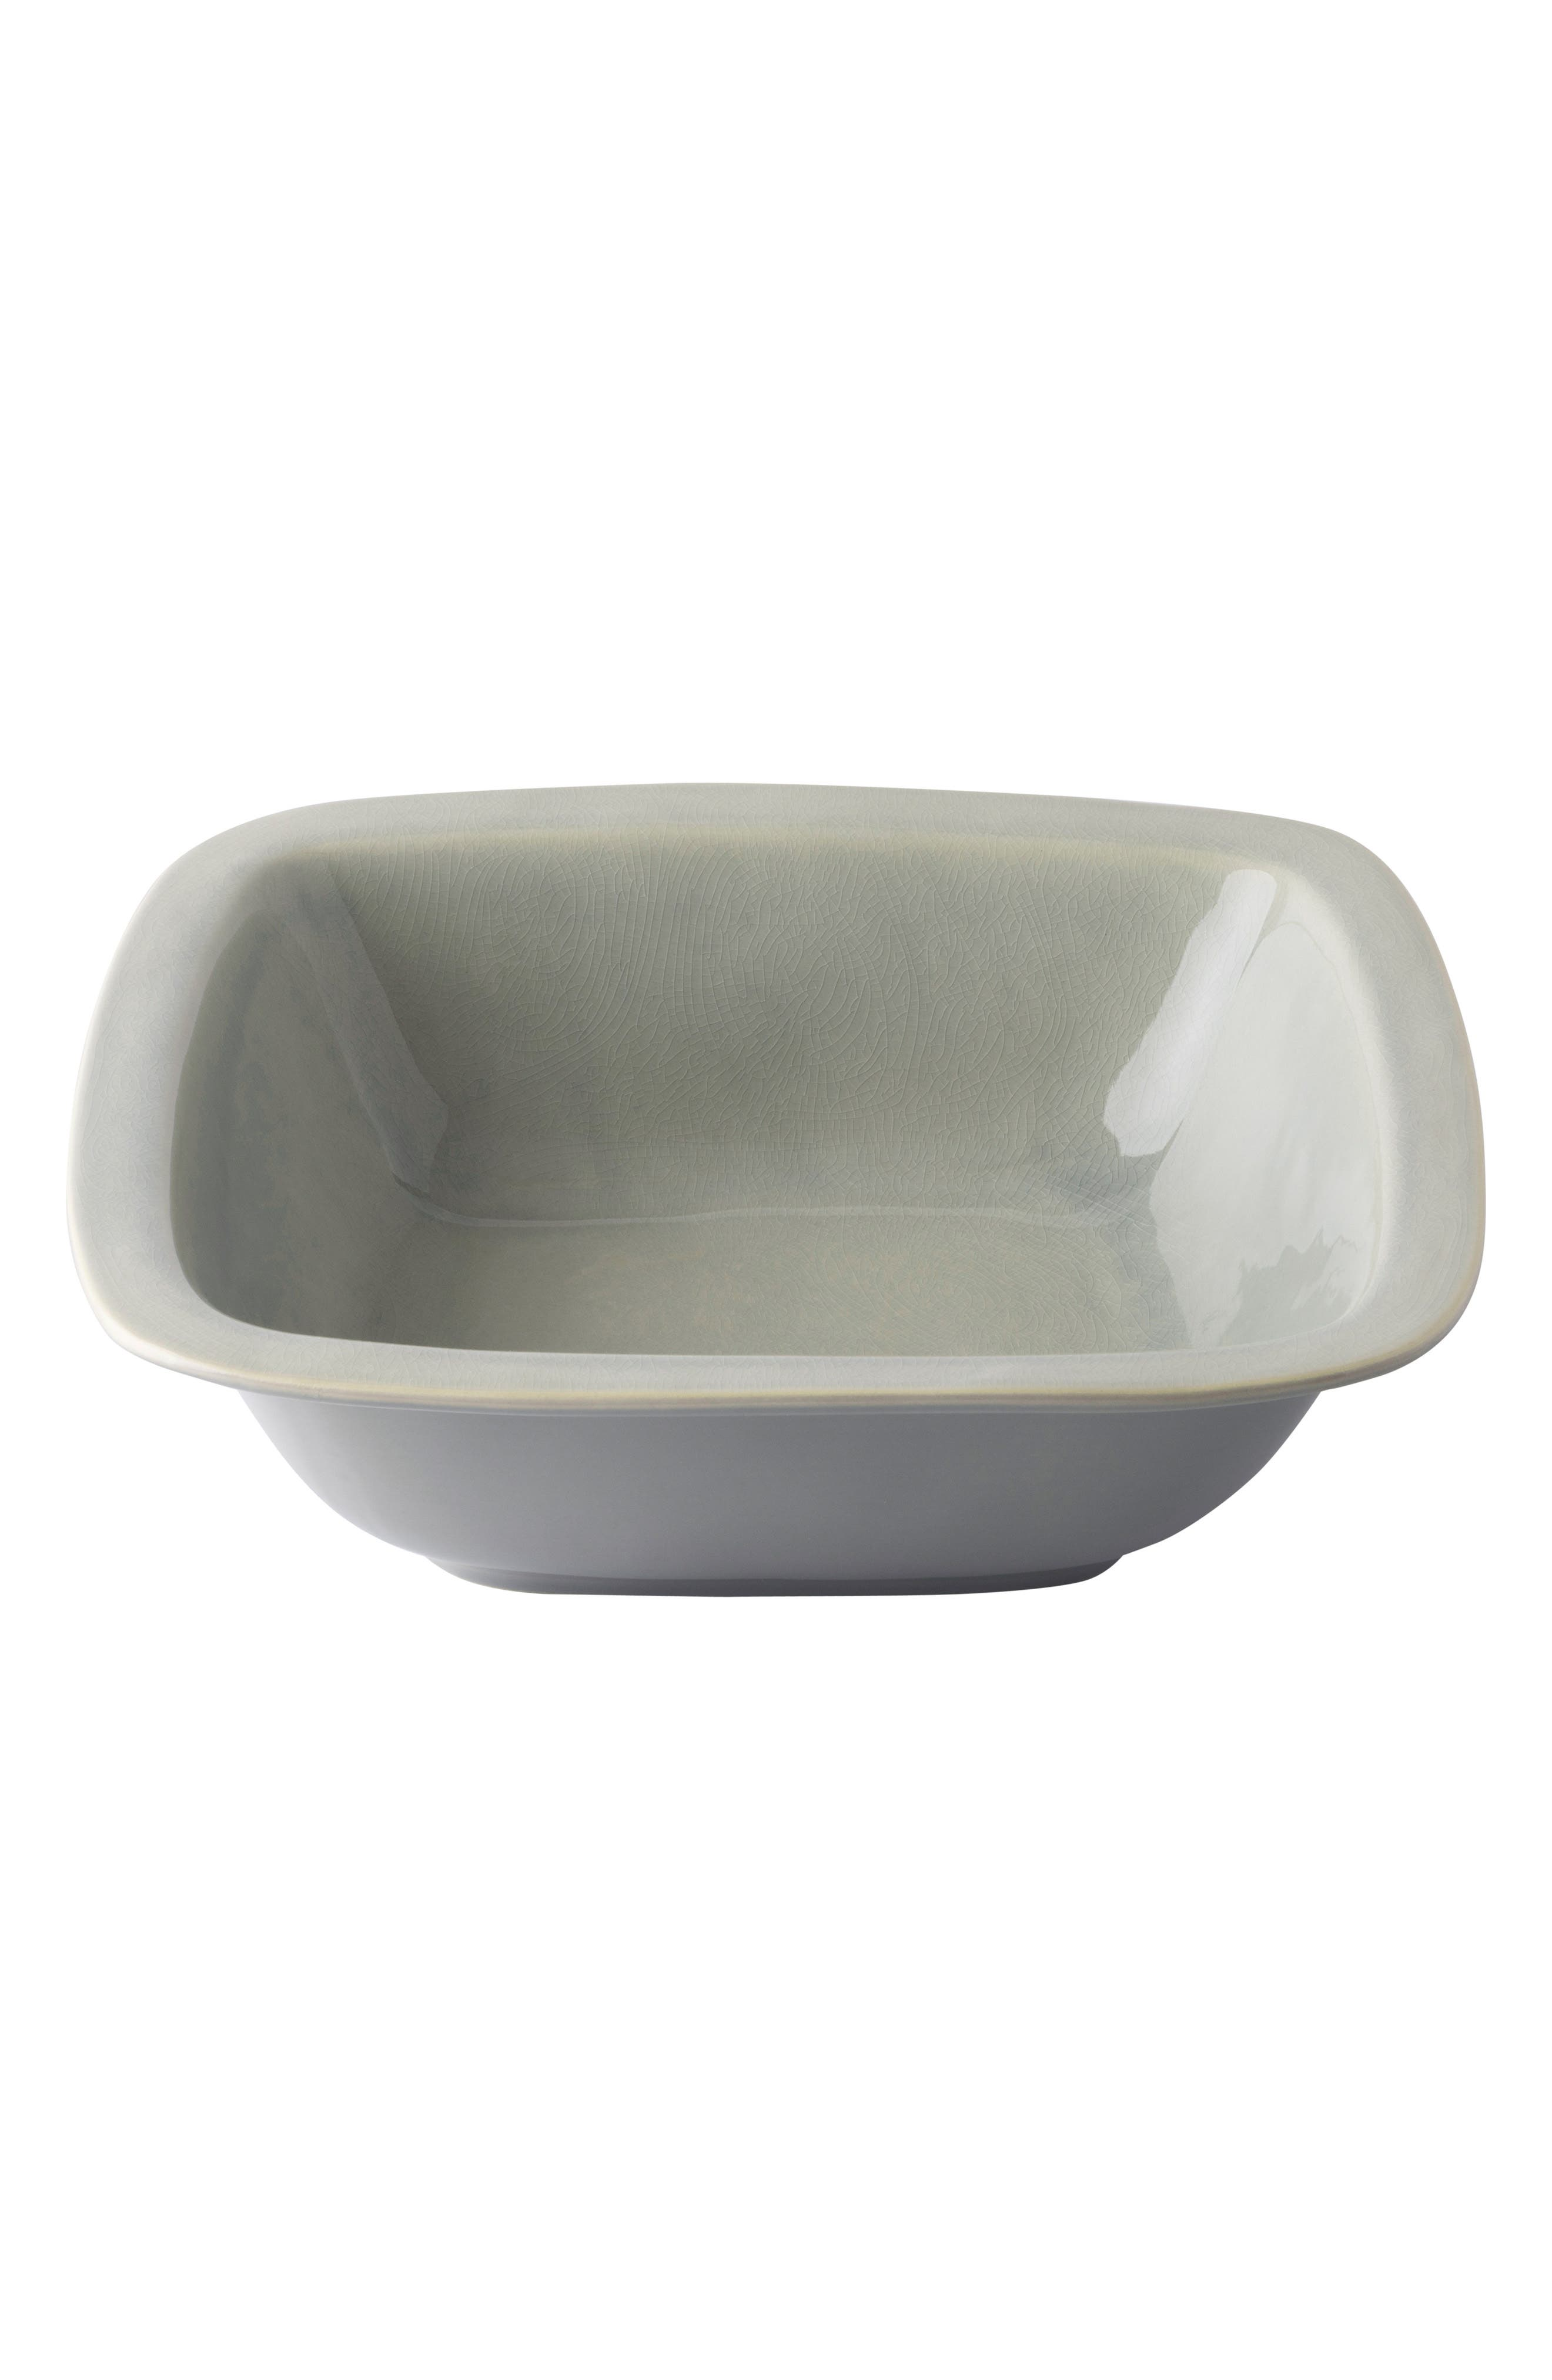 Puro Medium Ceramic Serving Bowl,                             Main thumbnail 1, color,                             MIST GREY CRACKLE